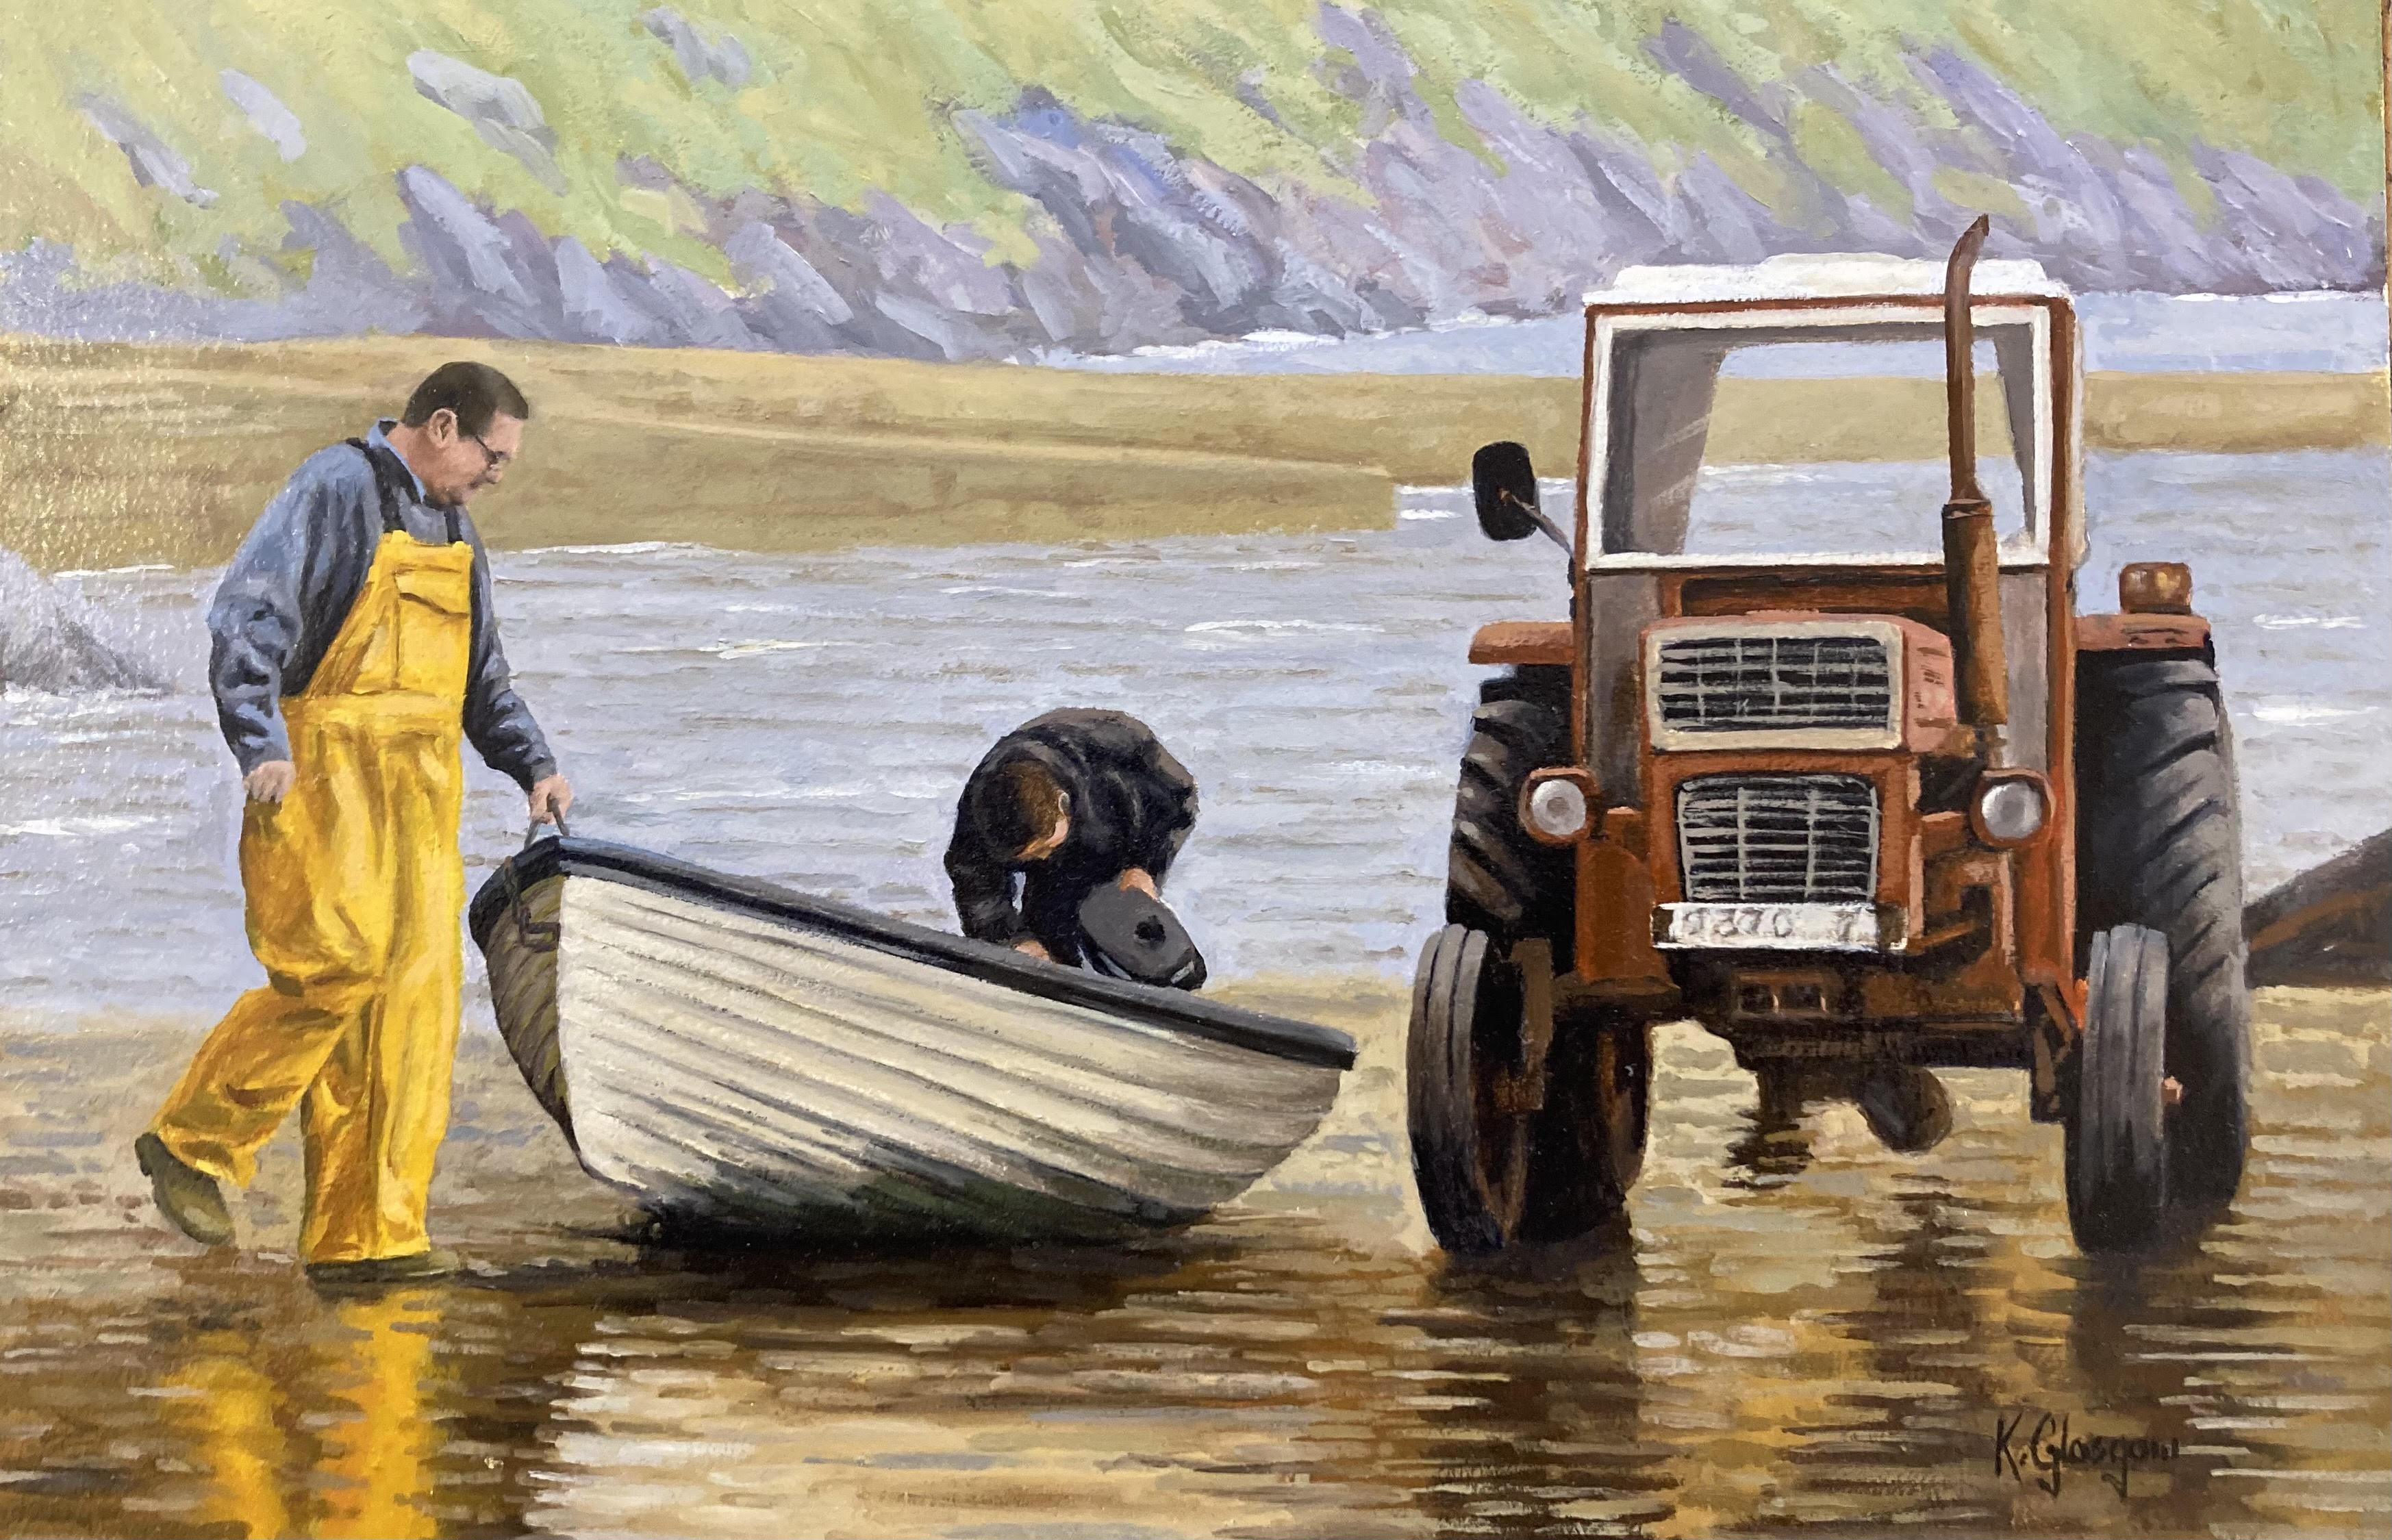 Mayo Boatmen by Keith Glasgow